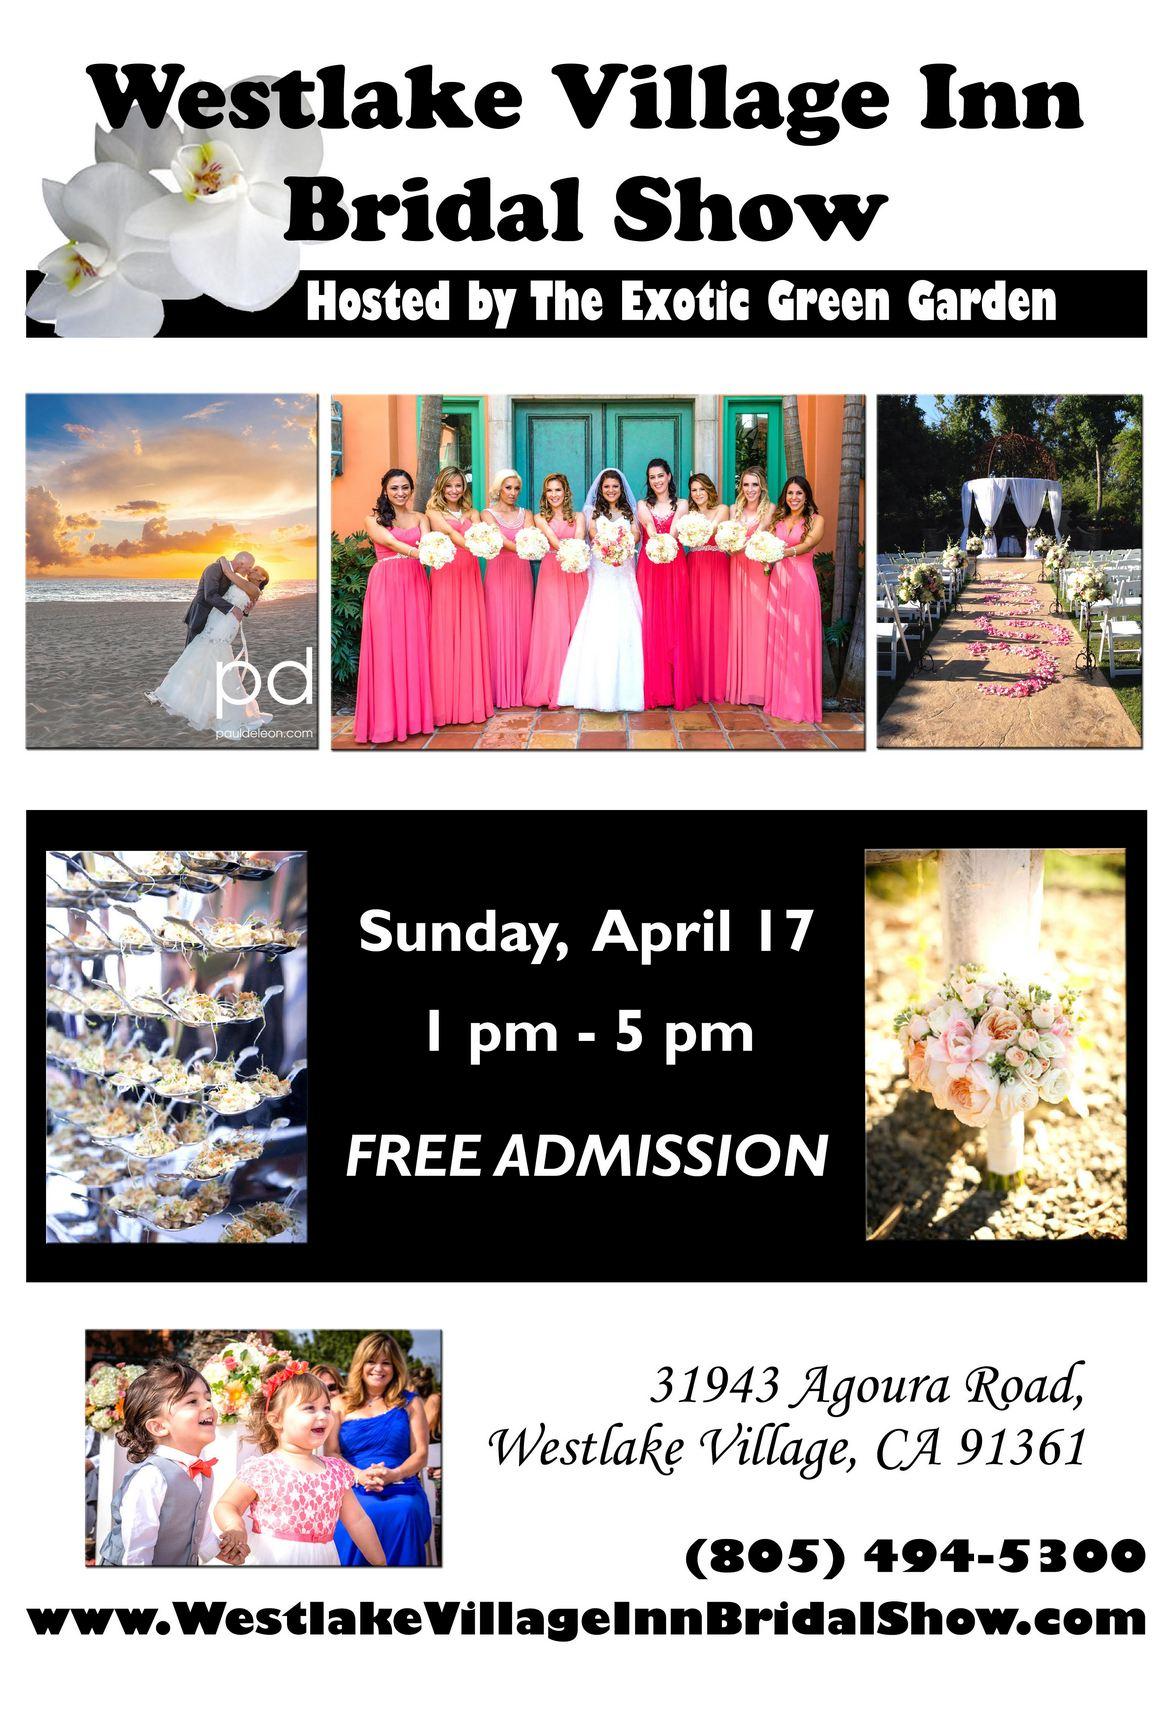 Westlake Village Inn Bridal Show